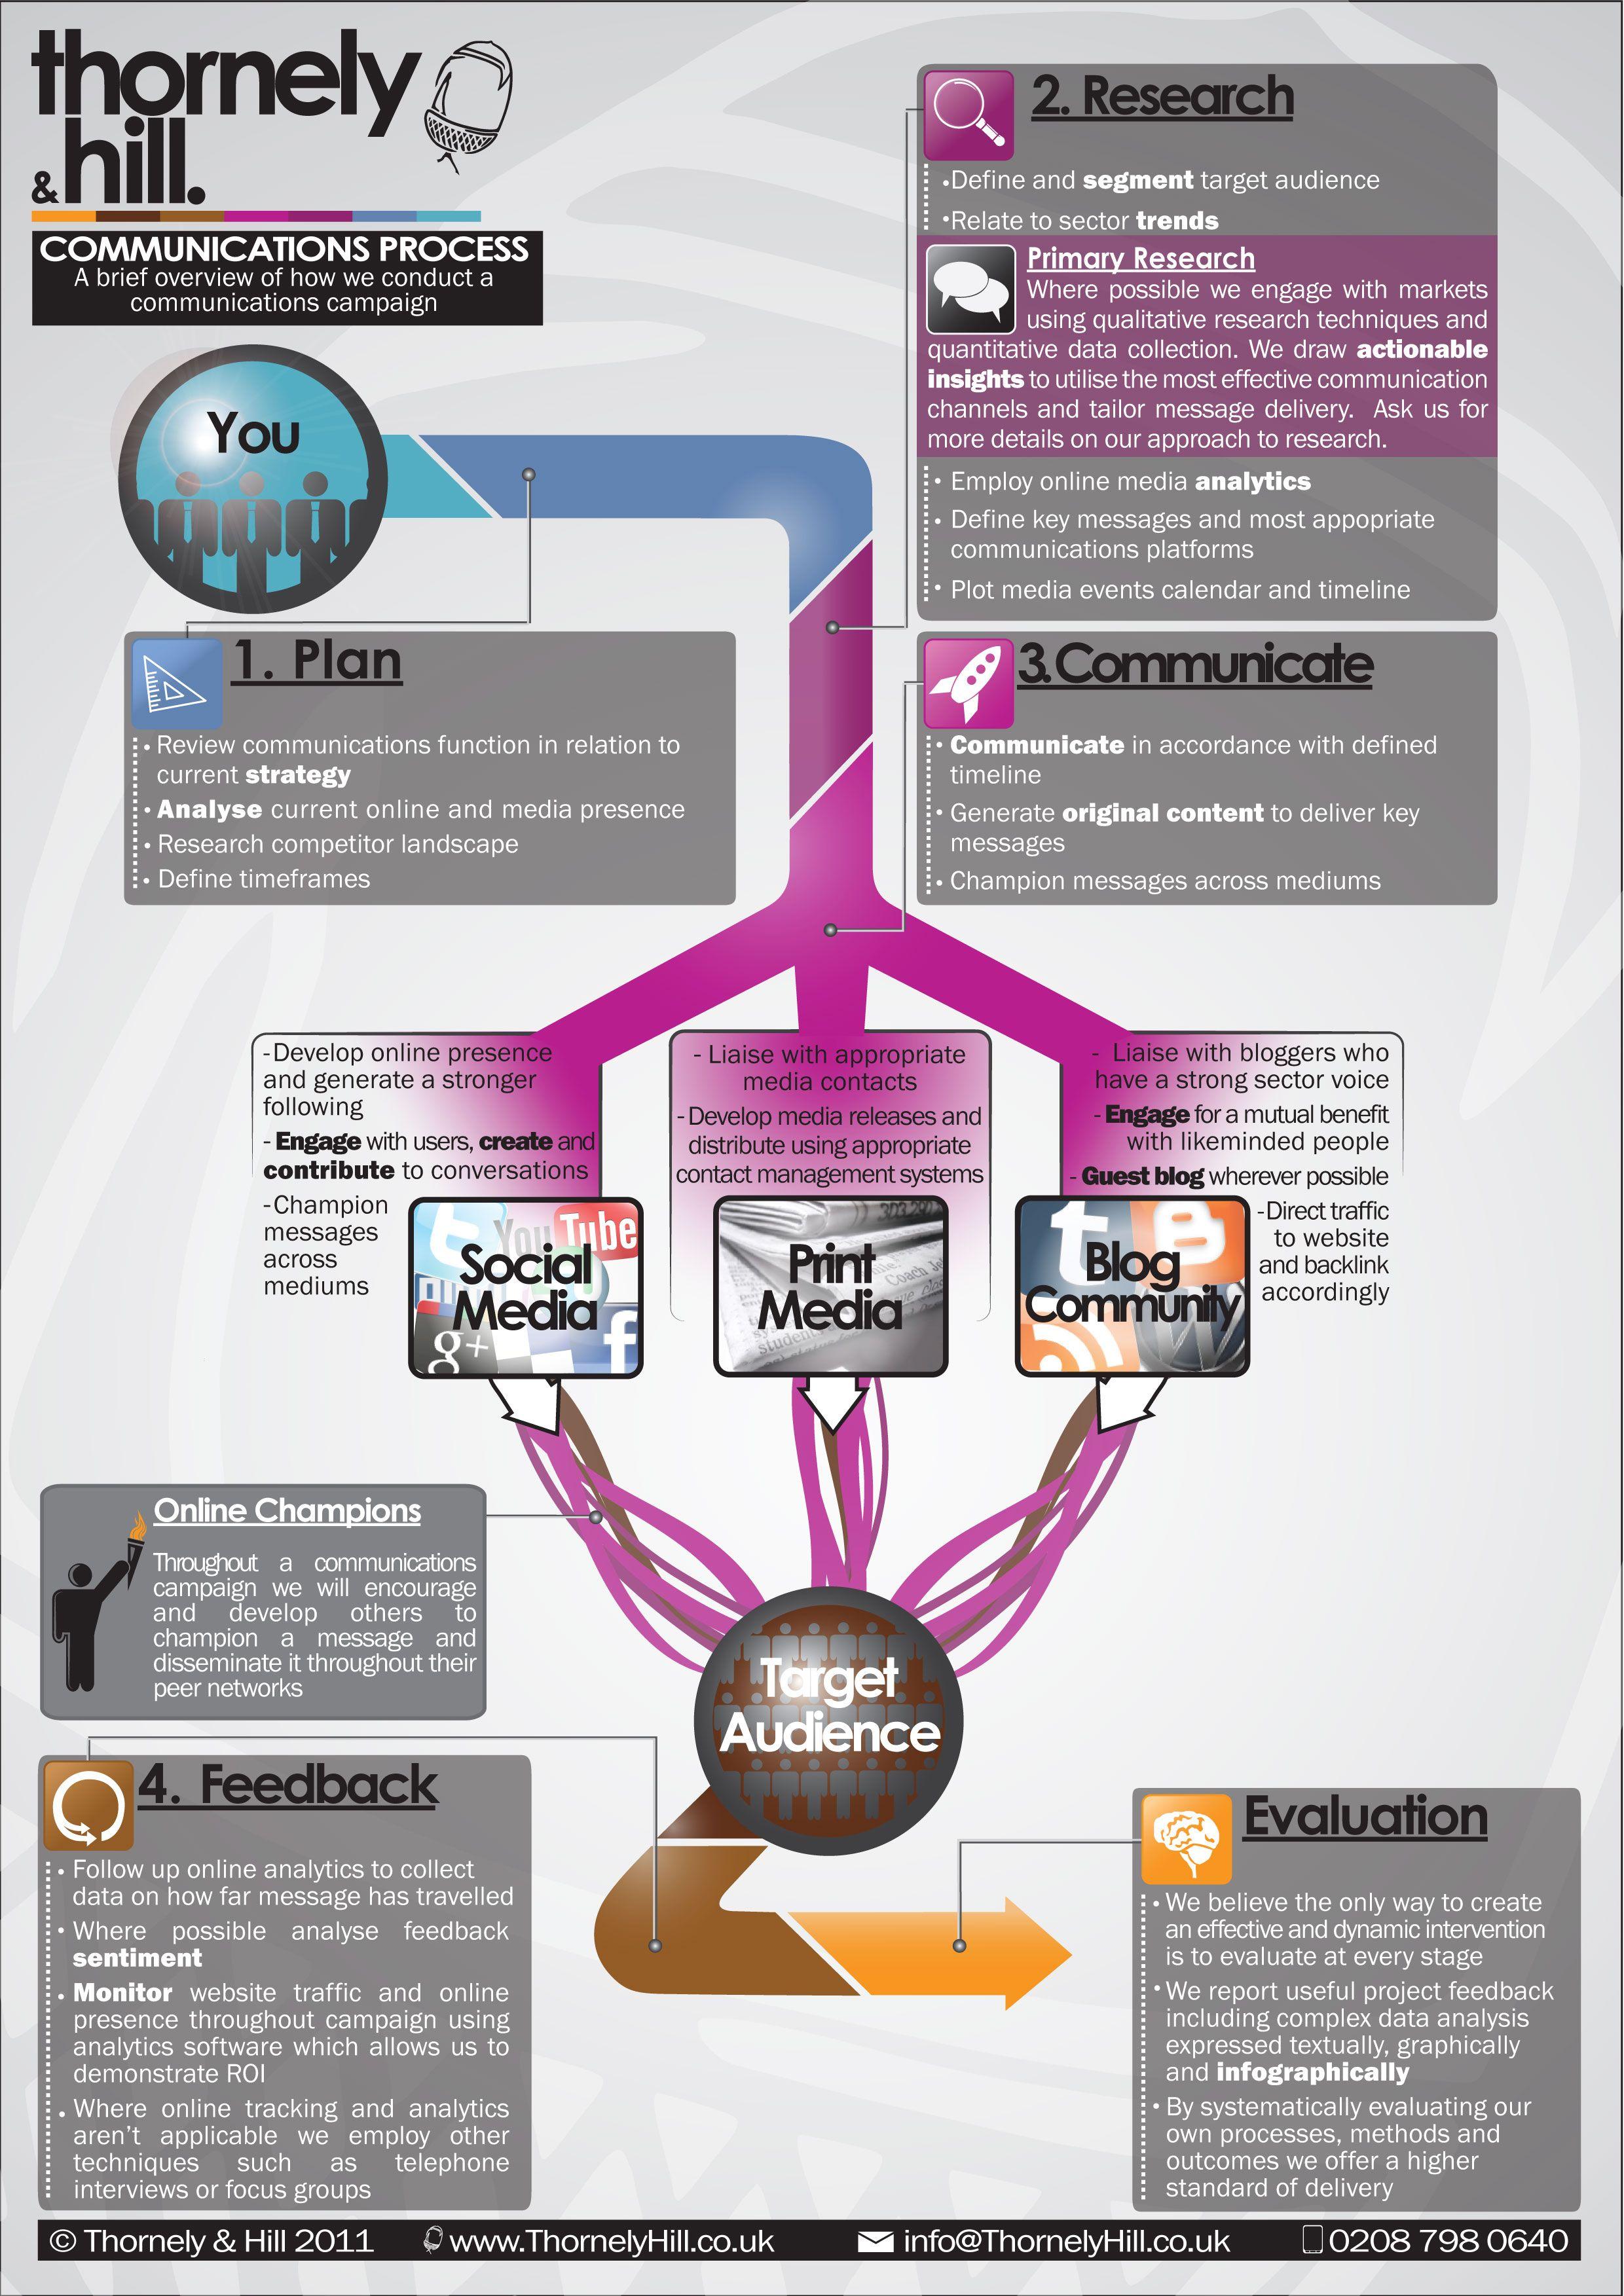 Communication Process Marketing Communicatie Communicatie Theorie